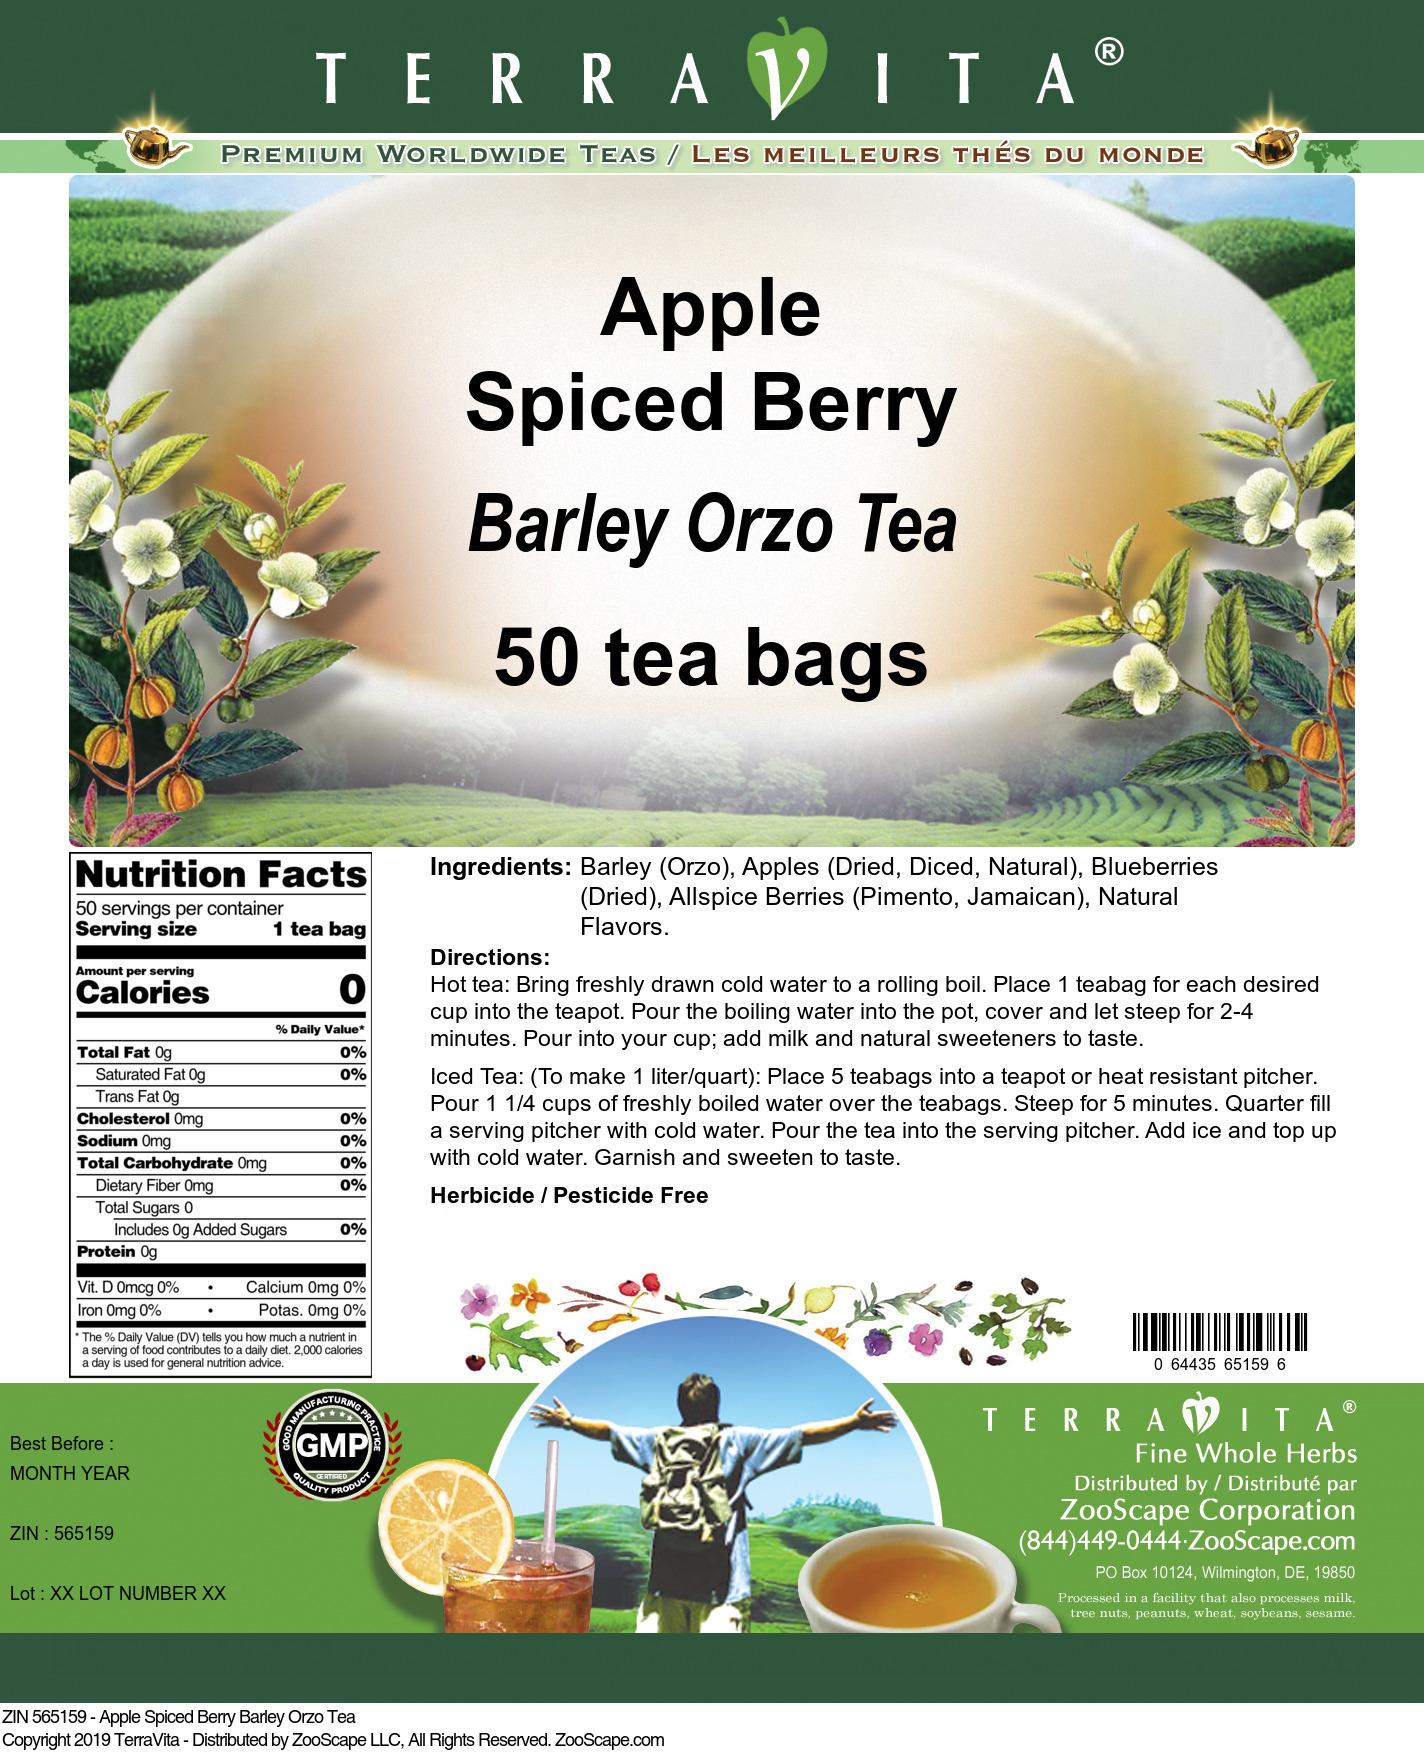 Apple Spiced Berry Barley Orzo